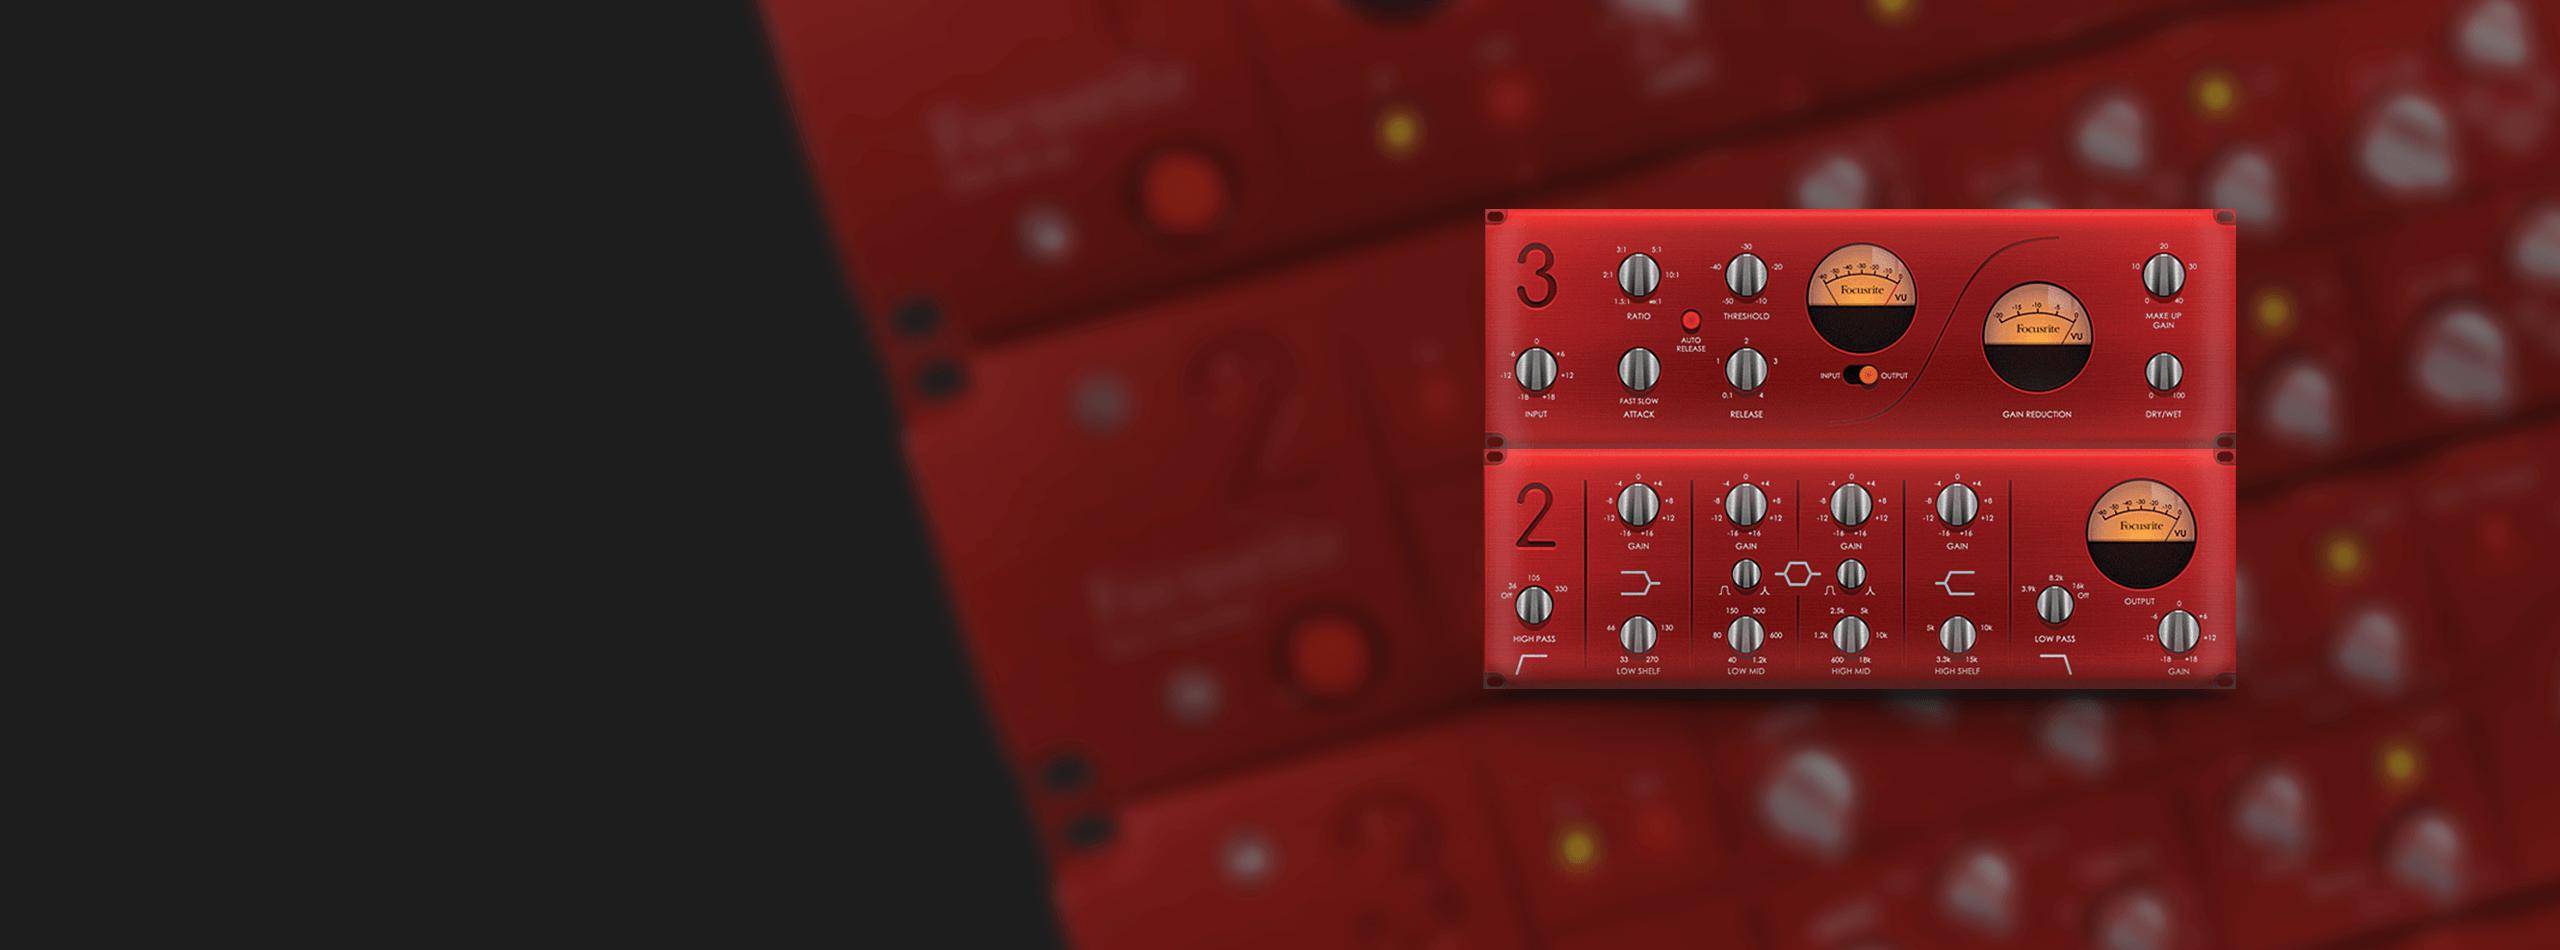 redplugins-header-2560-950.png